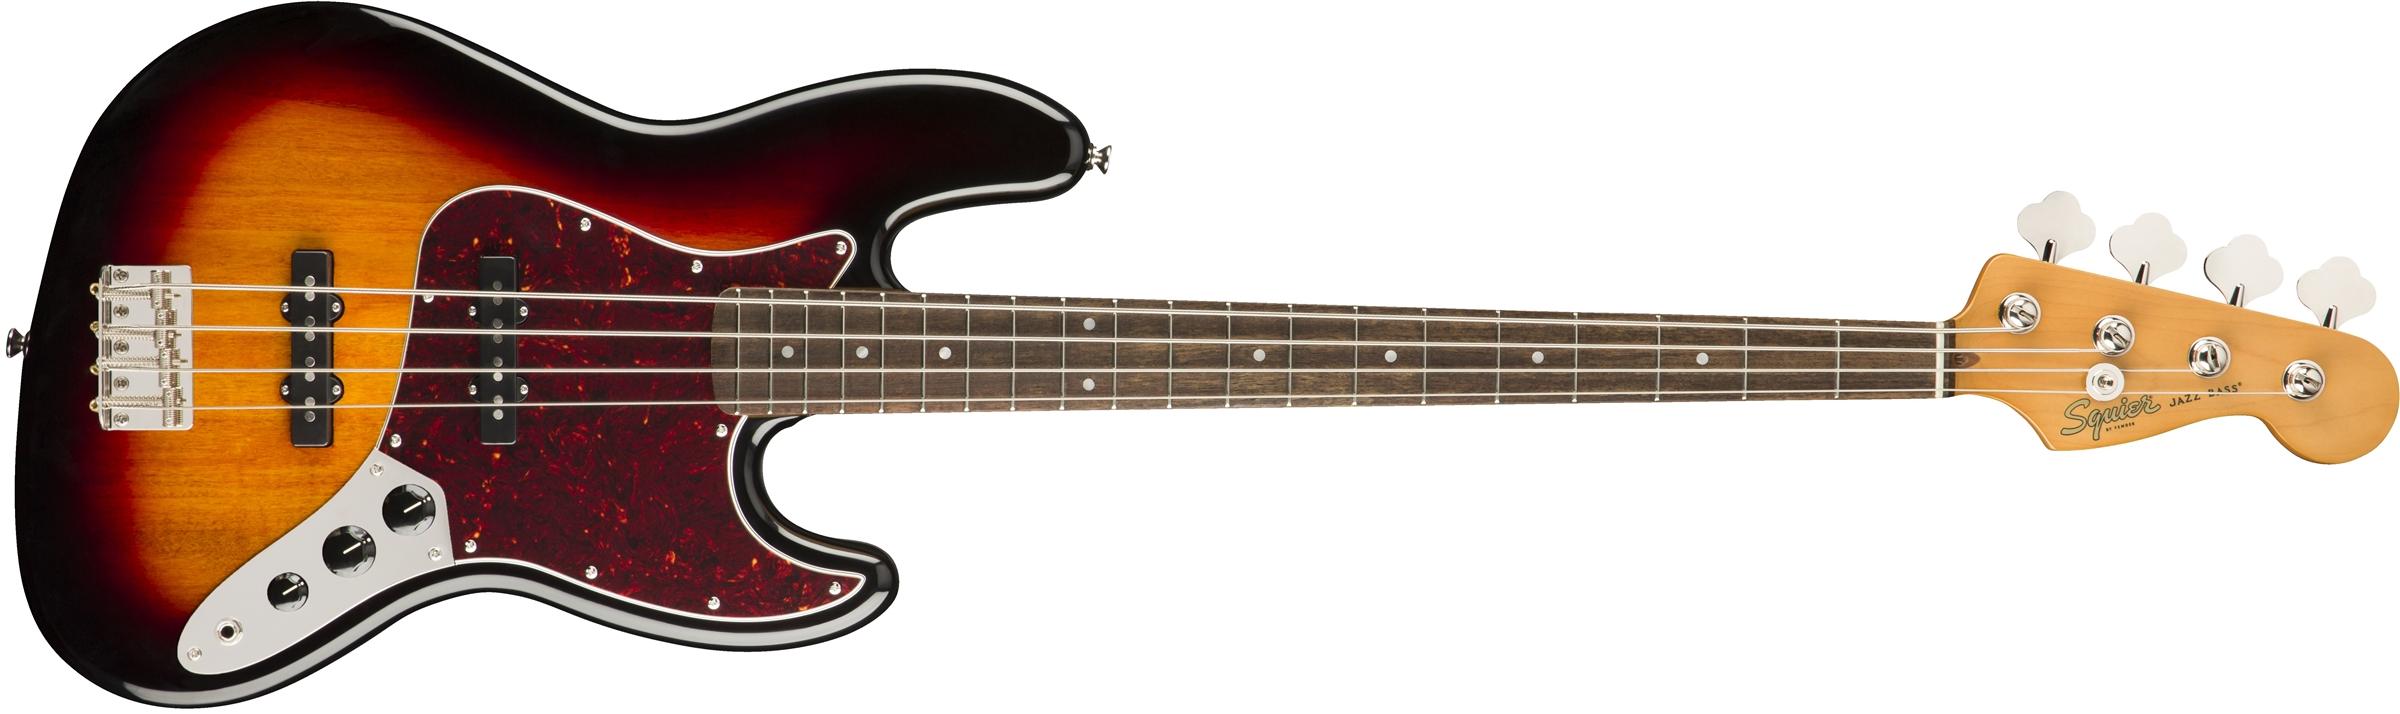 SQUIER-Classic-Vibe-60s-Jazz-Bass-LF-3-Color-Sunburst-0374530500-sku-22876